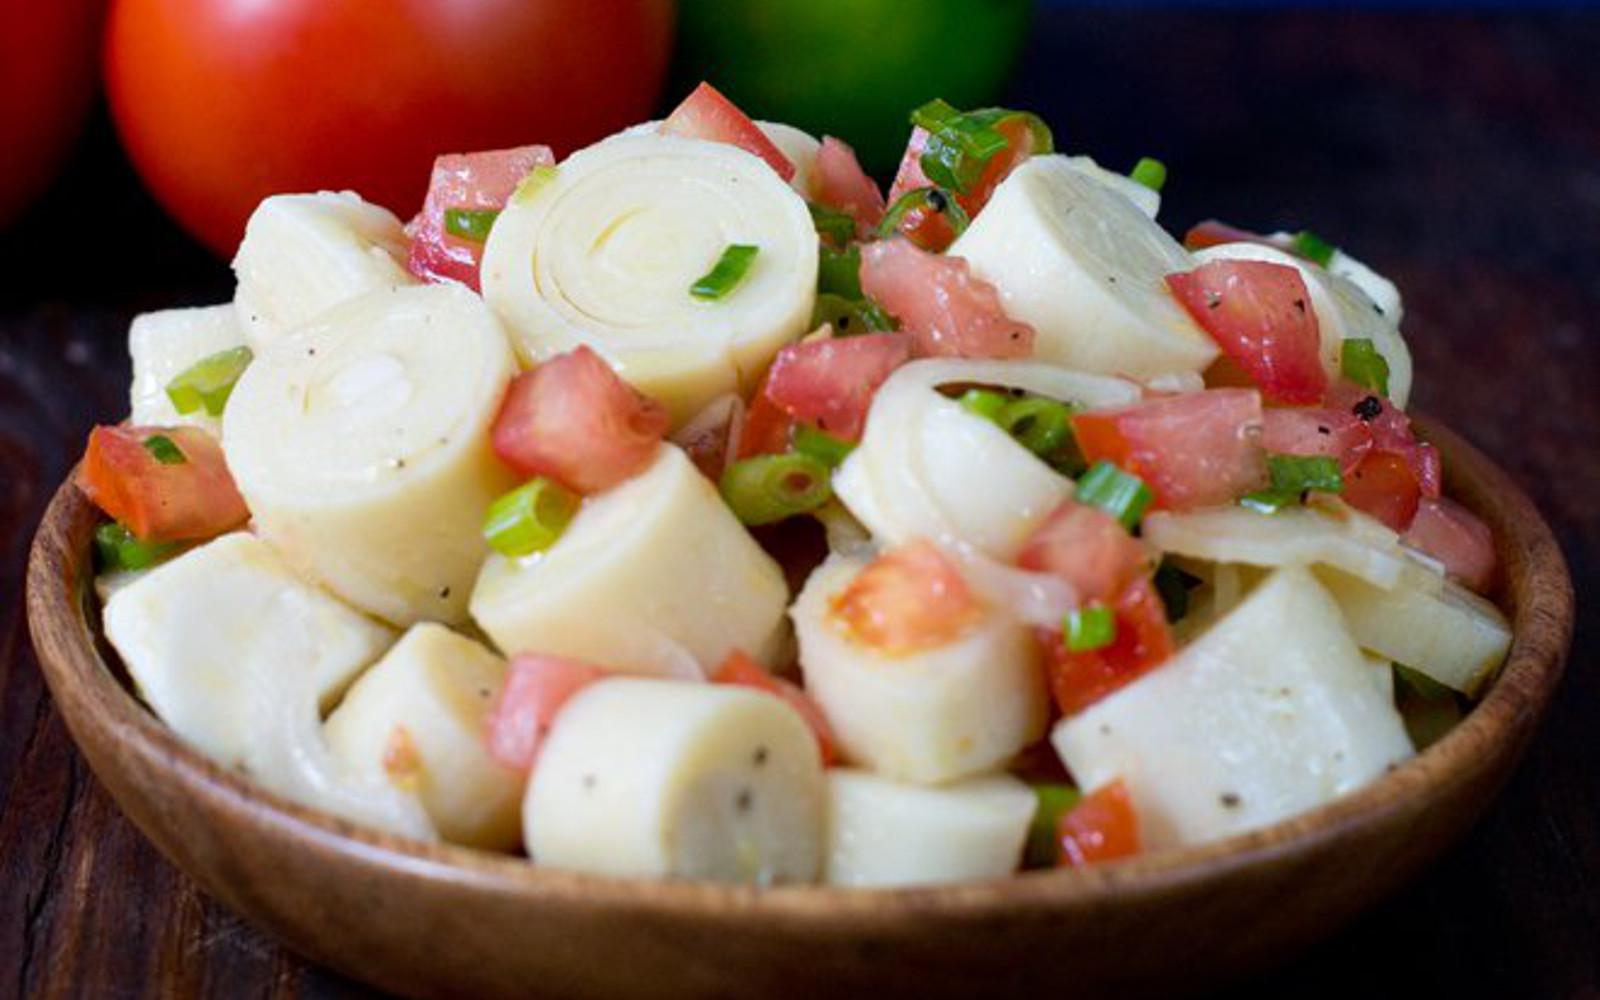 Brazillian Hearts of Palm Salad